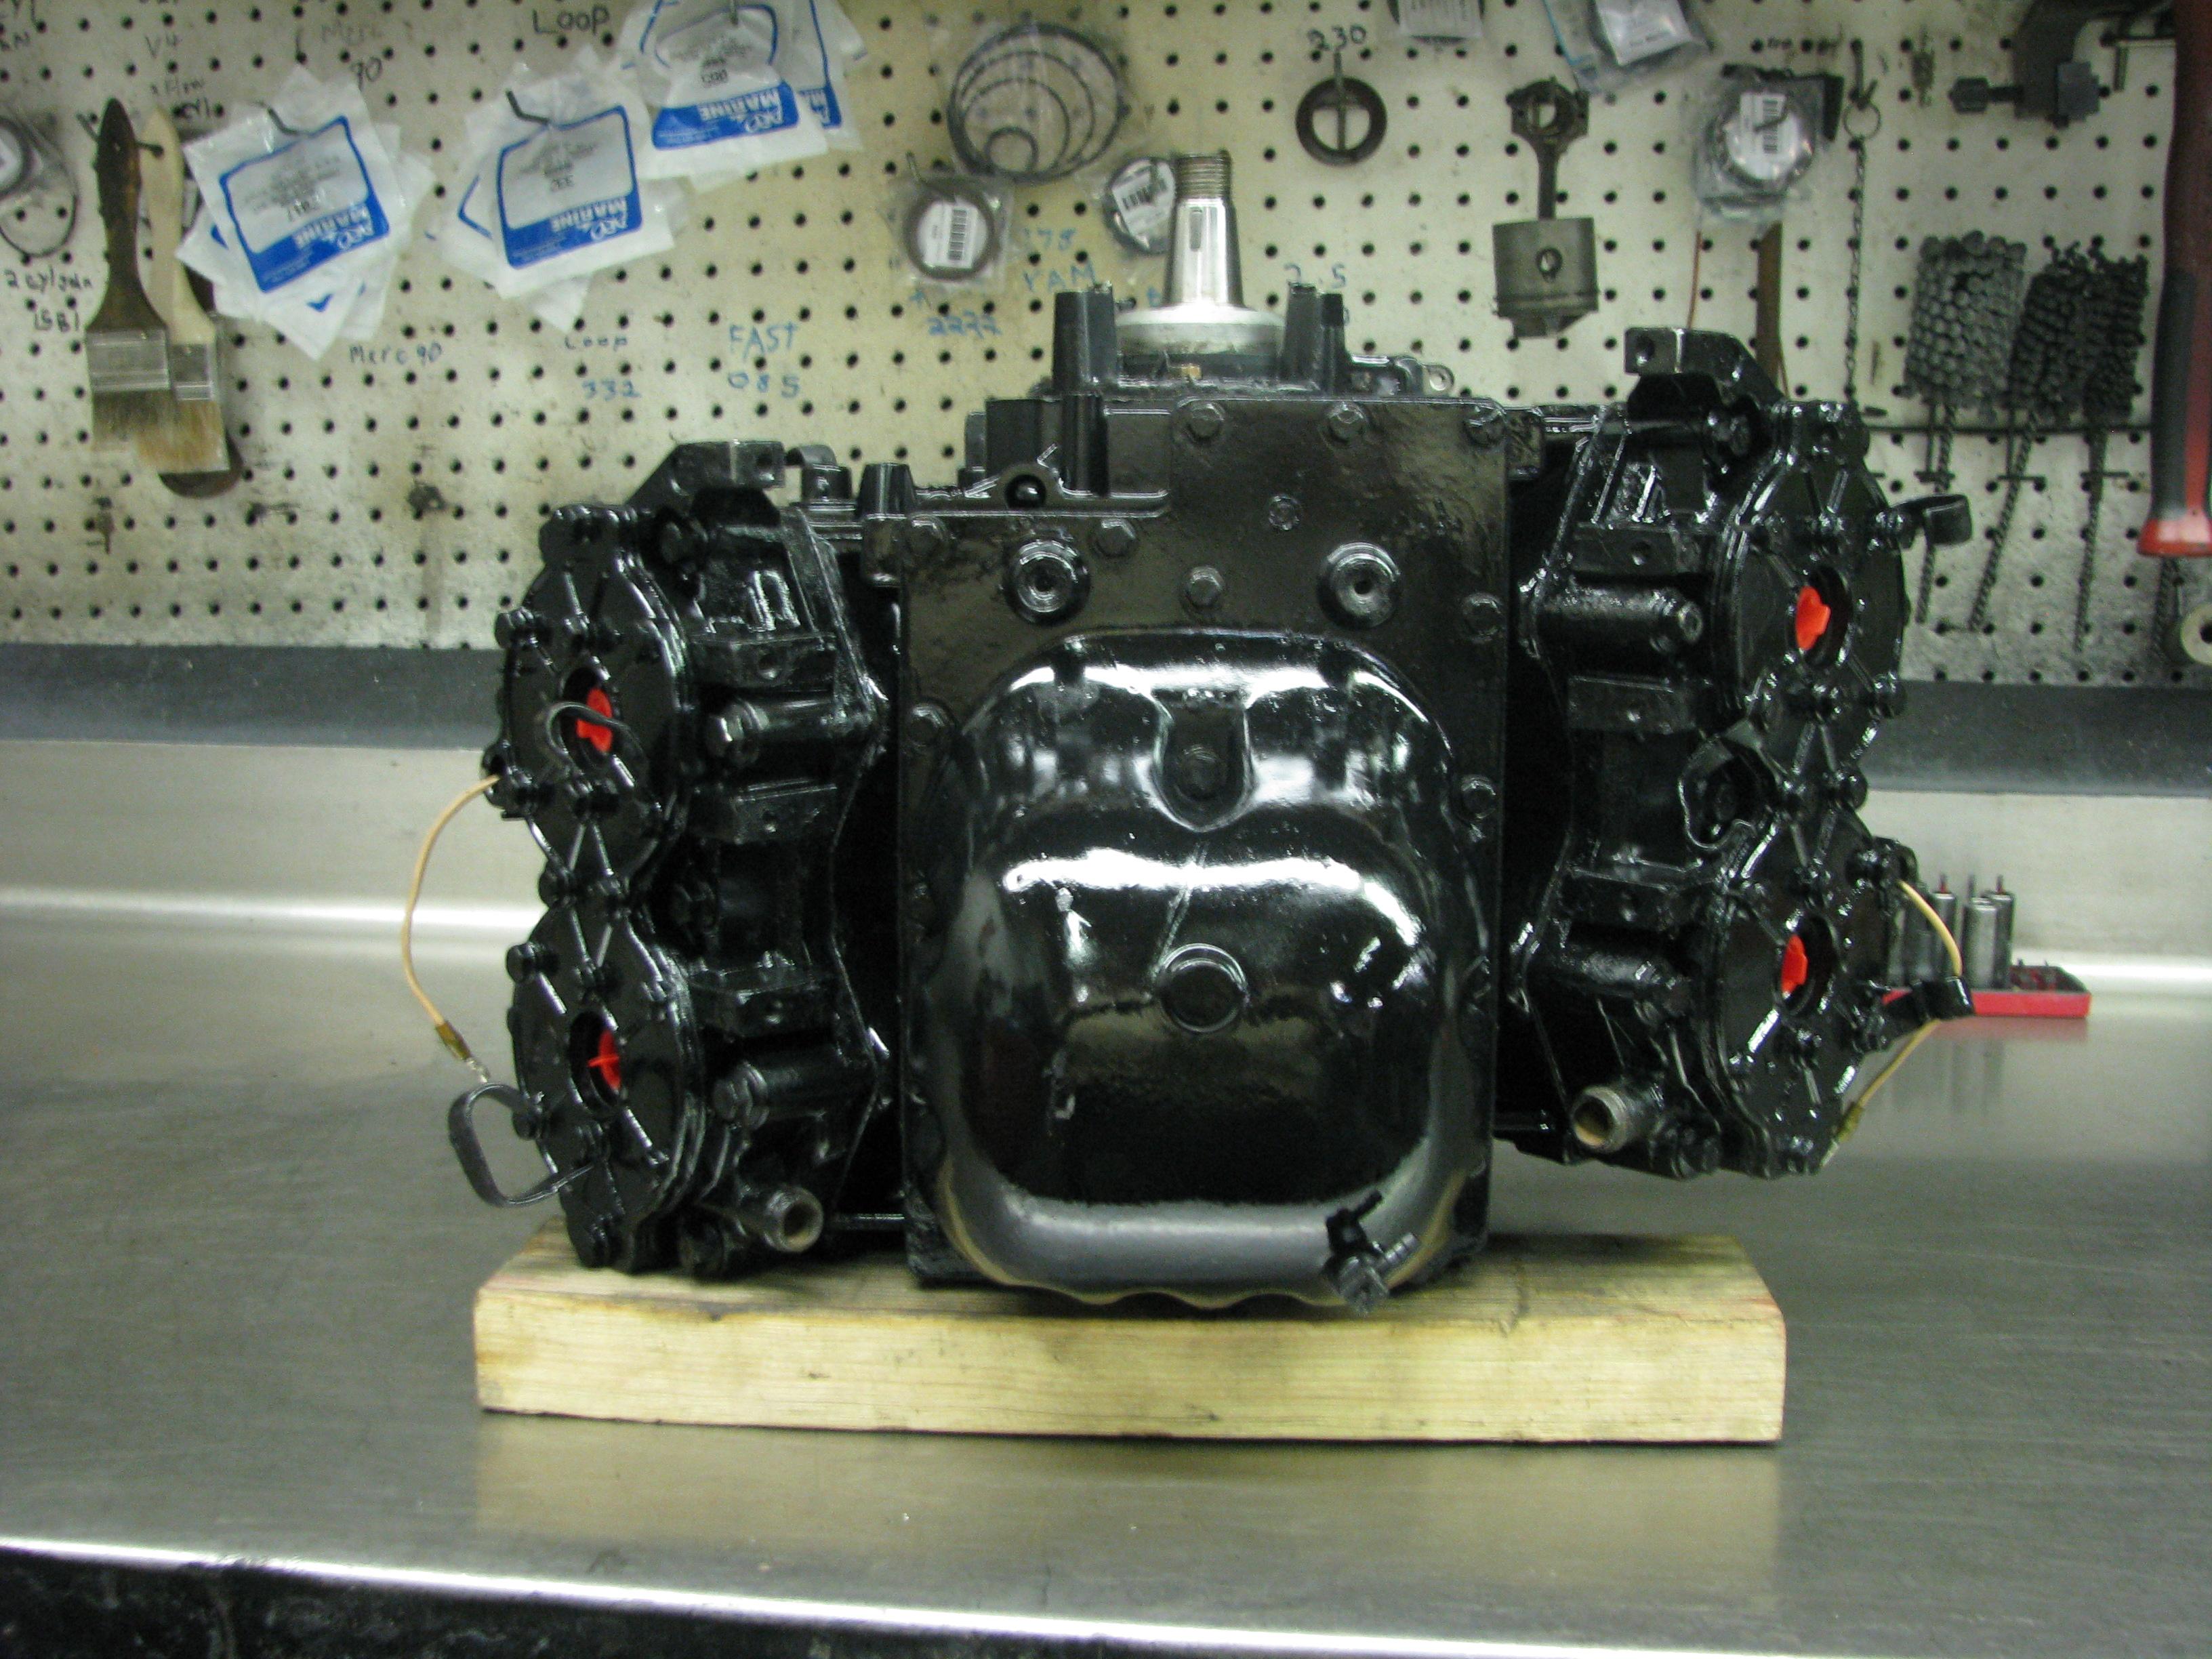 1991-1999 JOHNSON / EVINRUDE CROSSFLOW POWERHEADs 115 or 90 hp